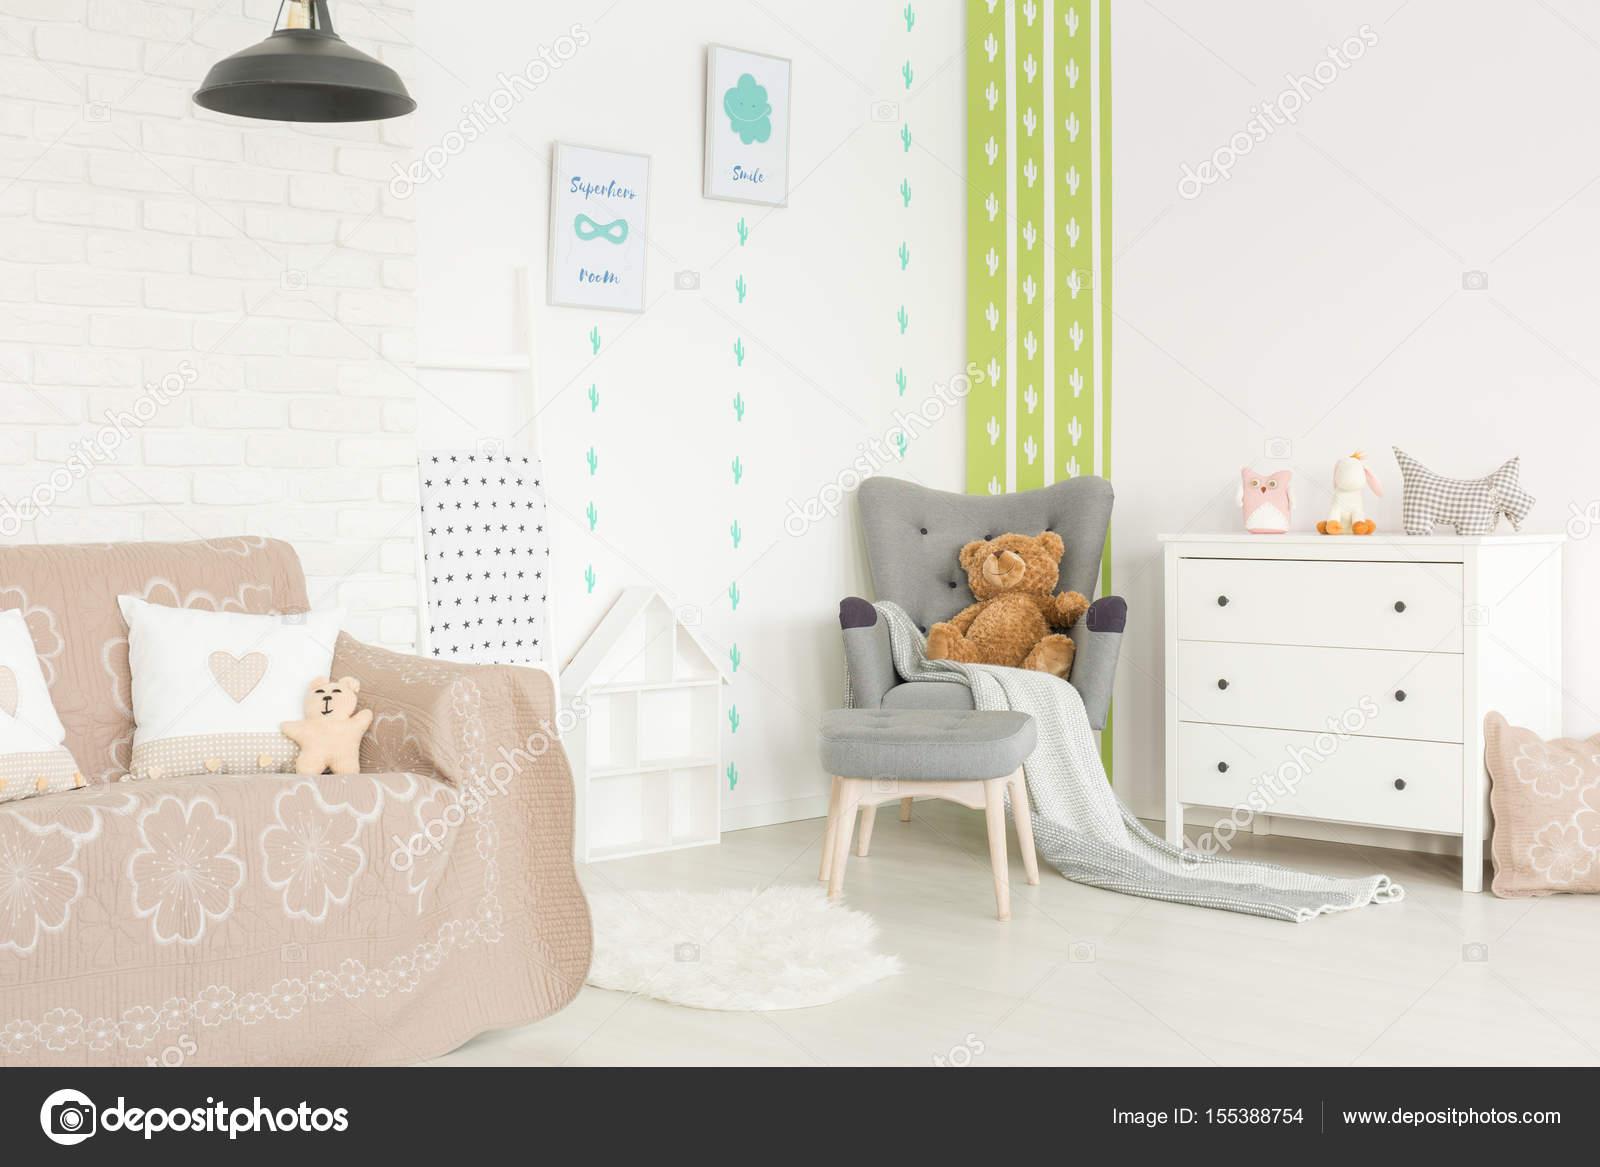 Poster Babykamer Pastel : Baby kamer met pastel toebehoren u2014 stockfoto © photographee.eu